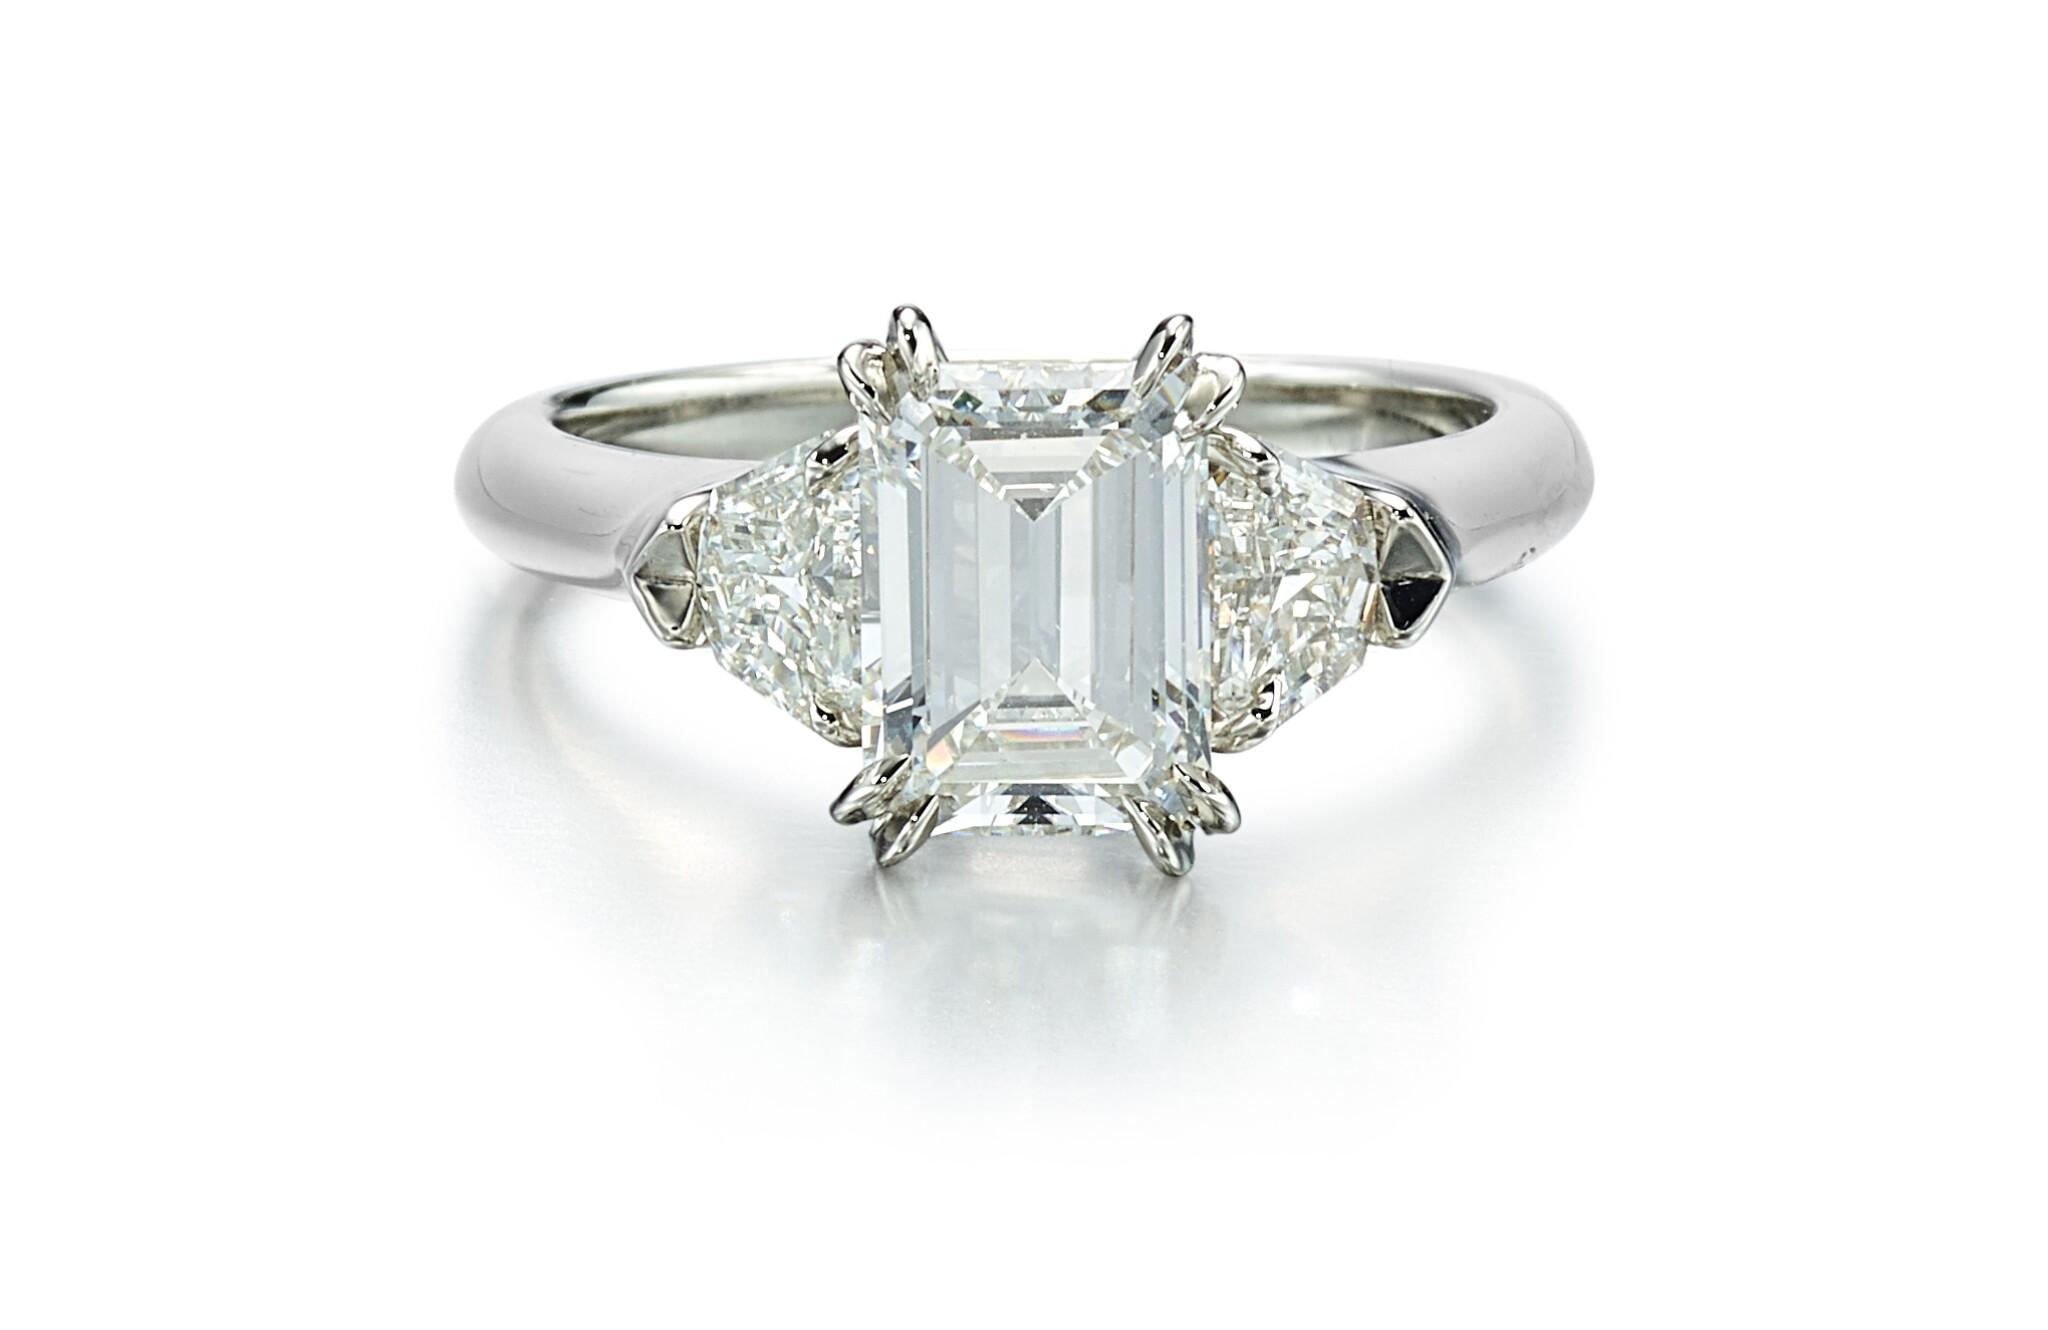 View full screen - View 1 of Lot 9146. DIAMOND RING, HARRY WINSTON   1.71卡拉 方形 E色 VVS2淨度 鑽石 戒指, 海瑞溫斯頓 ( Harry Winston ).